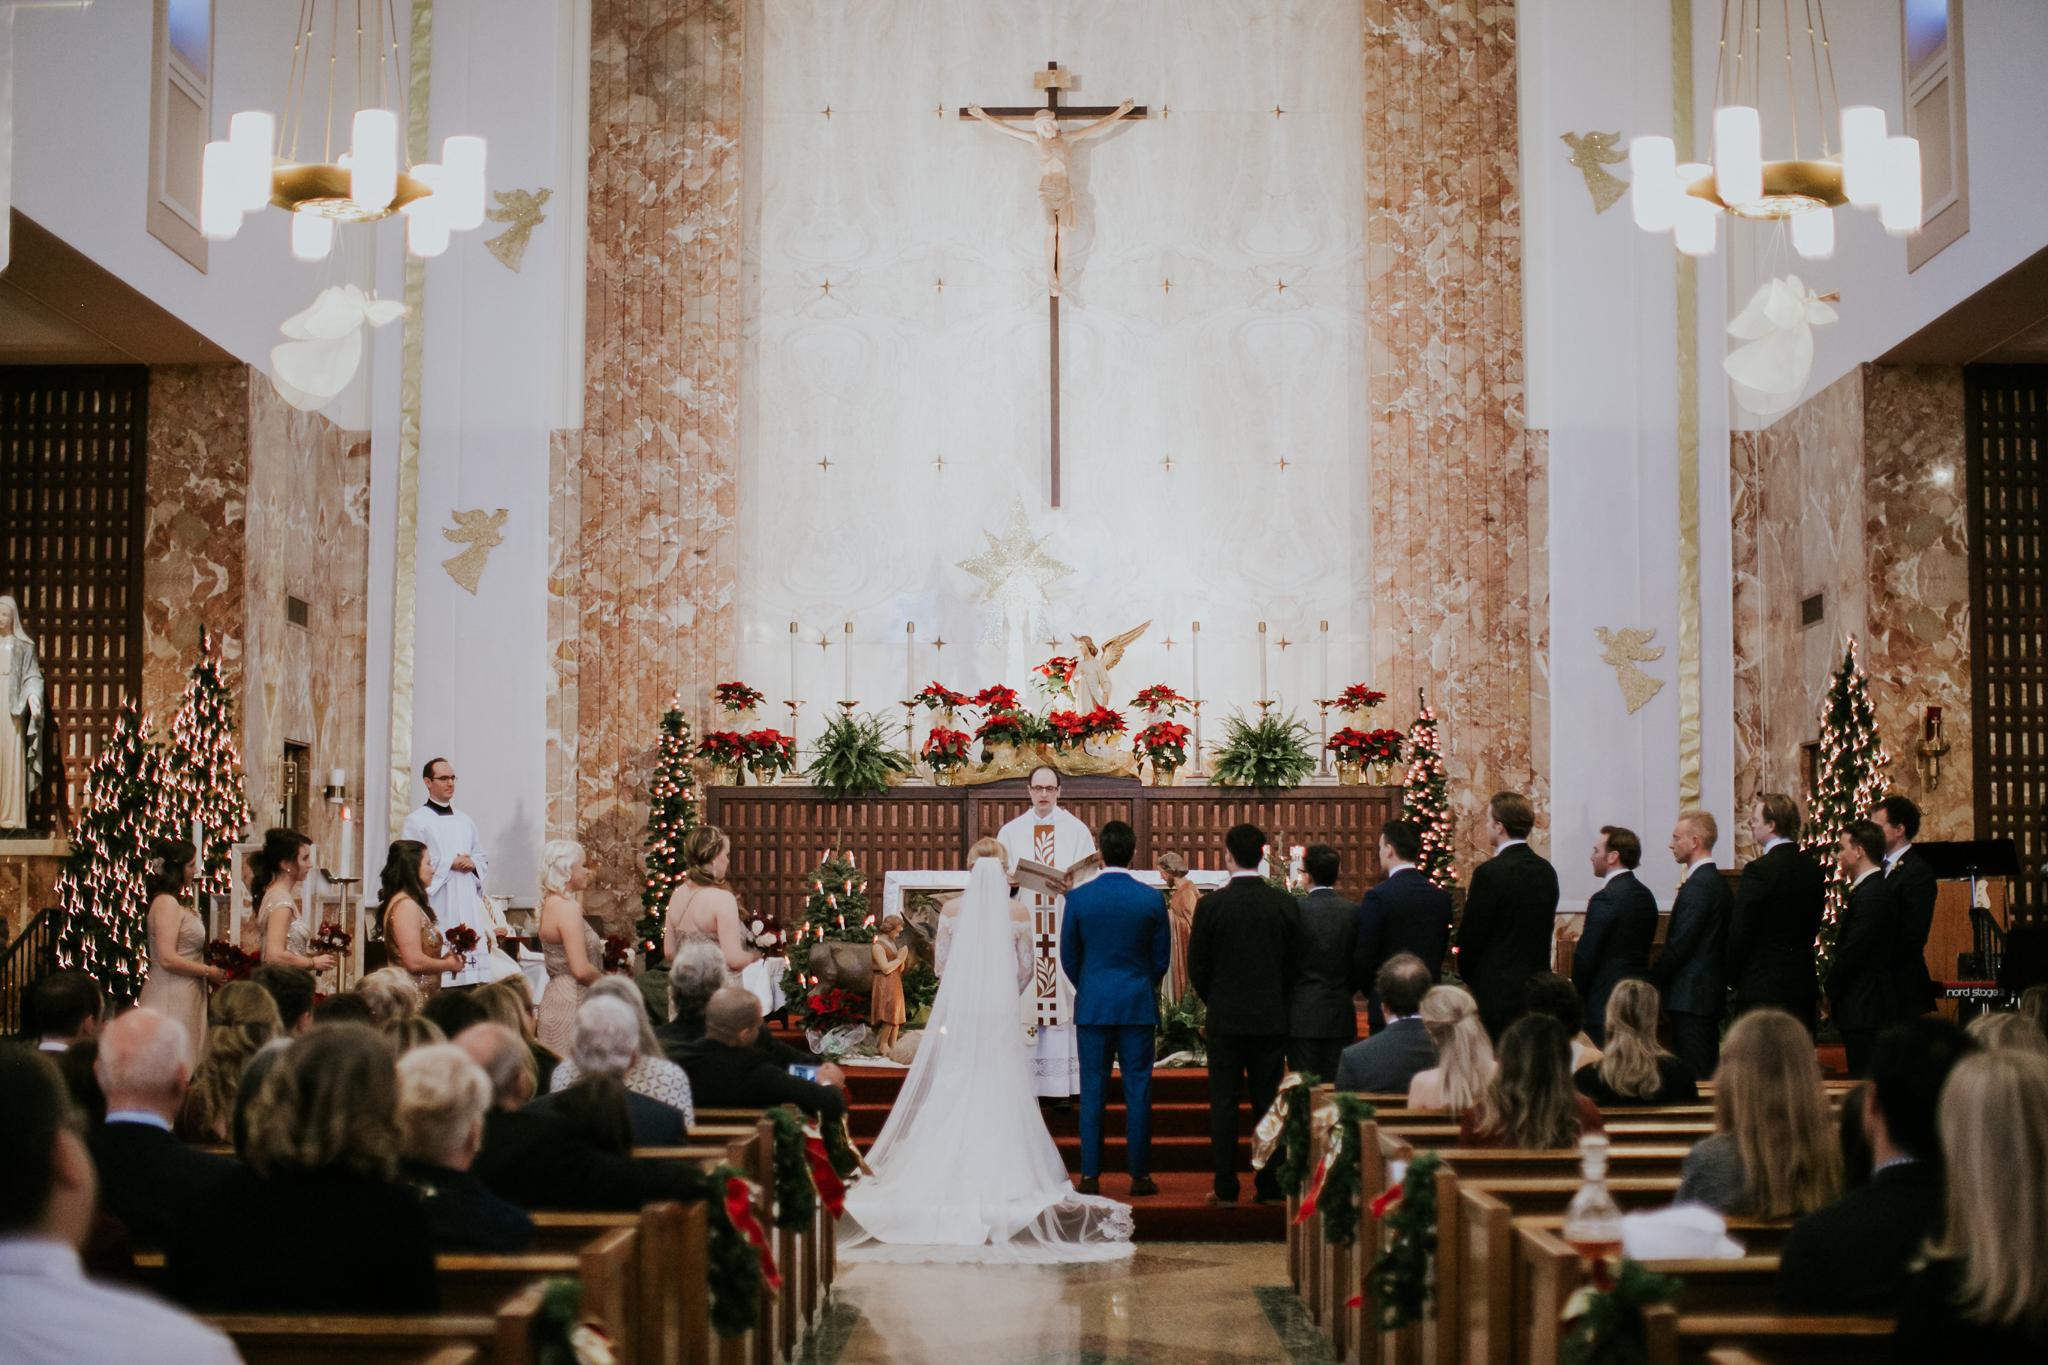 20151230_hussem_wedding_0455_web.jpg